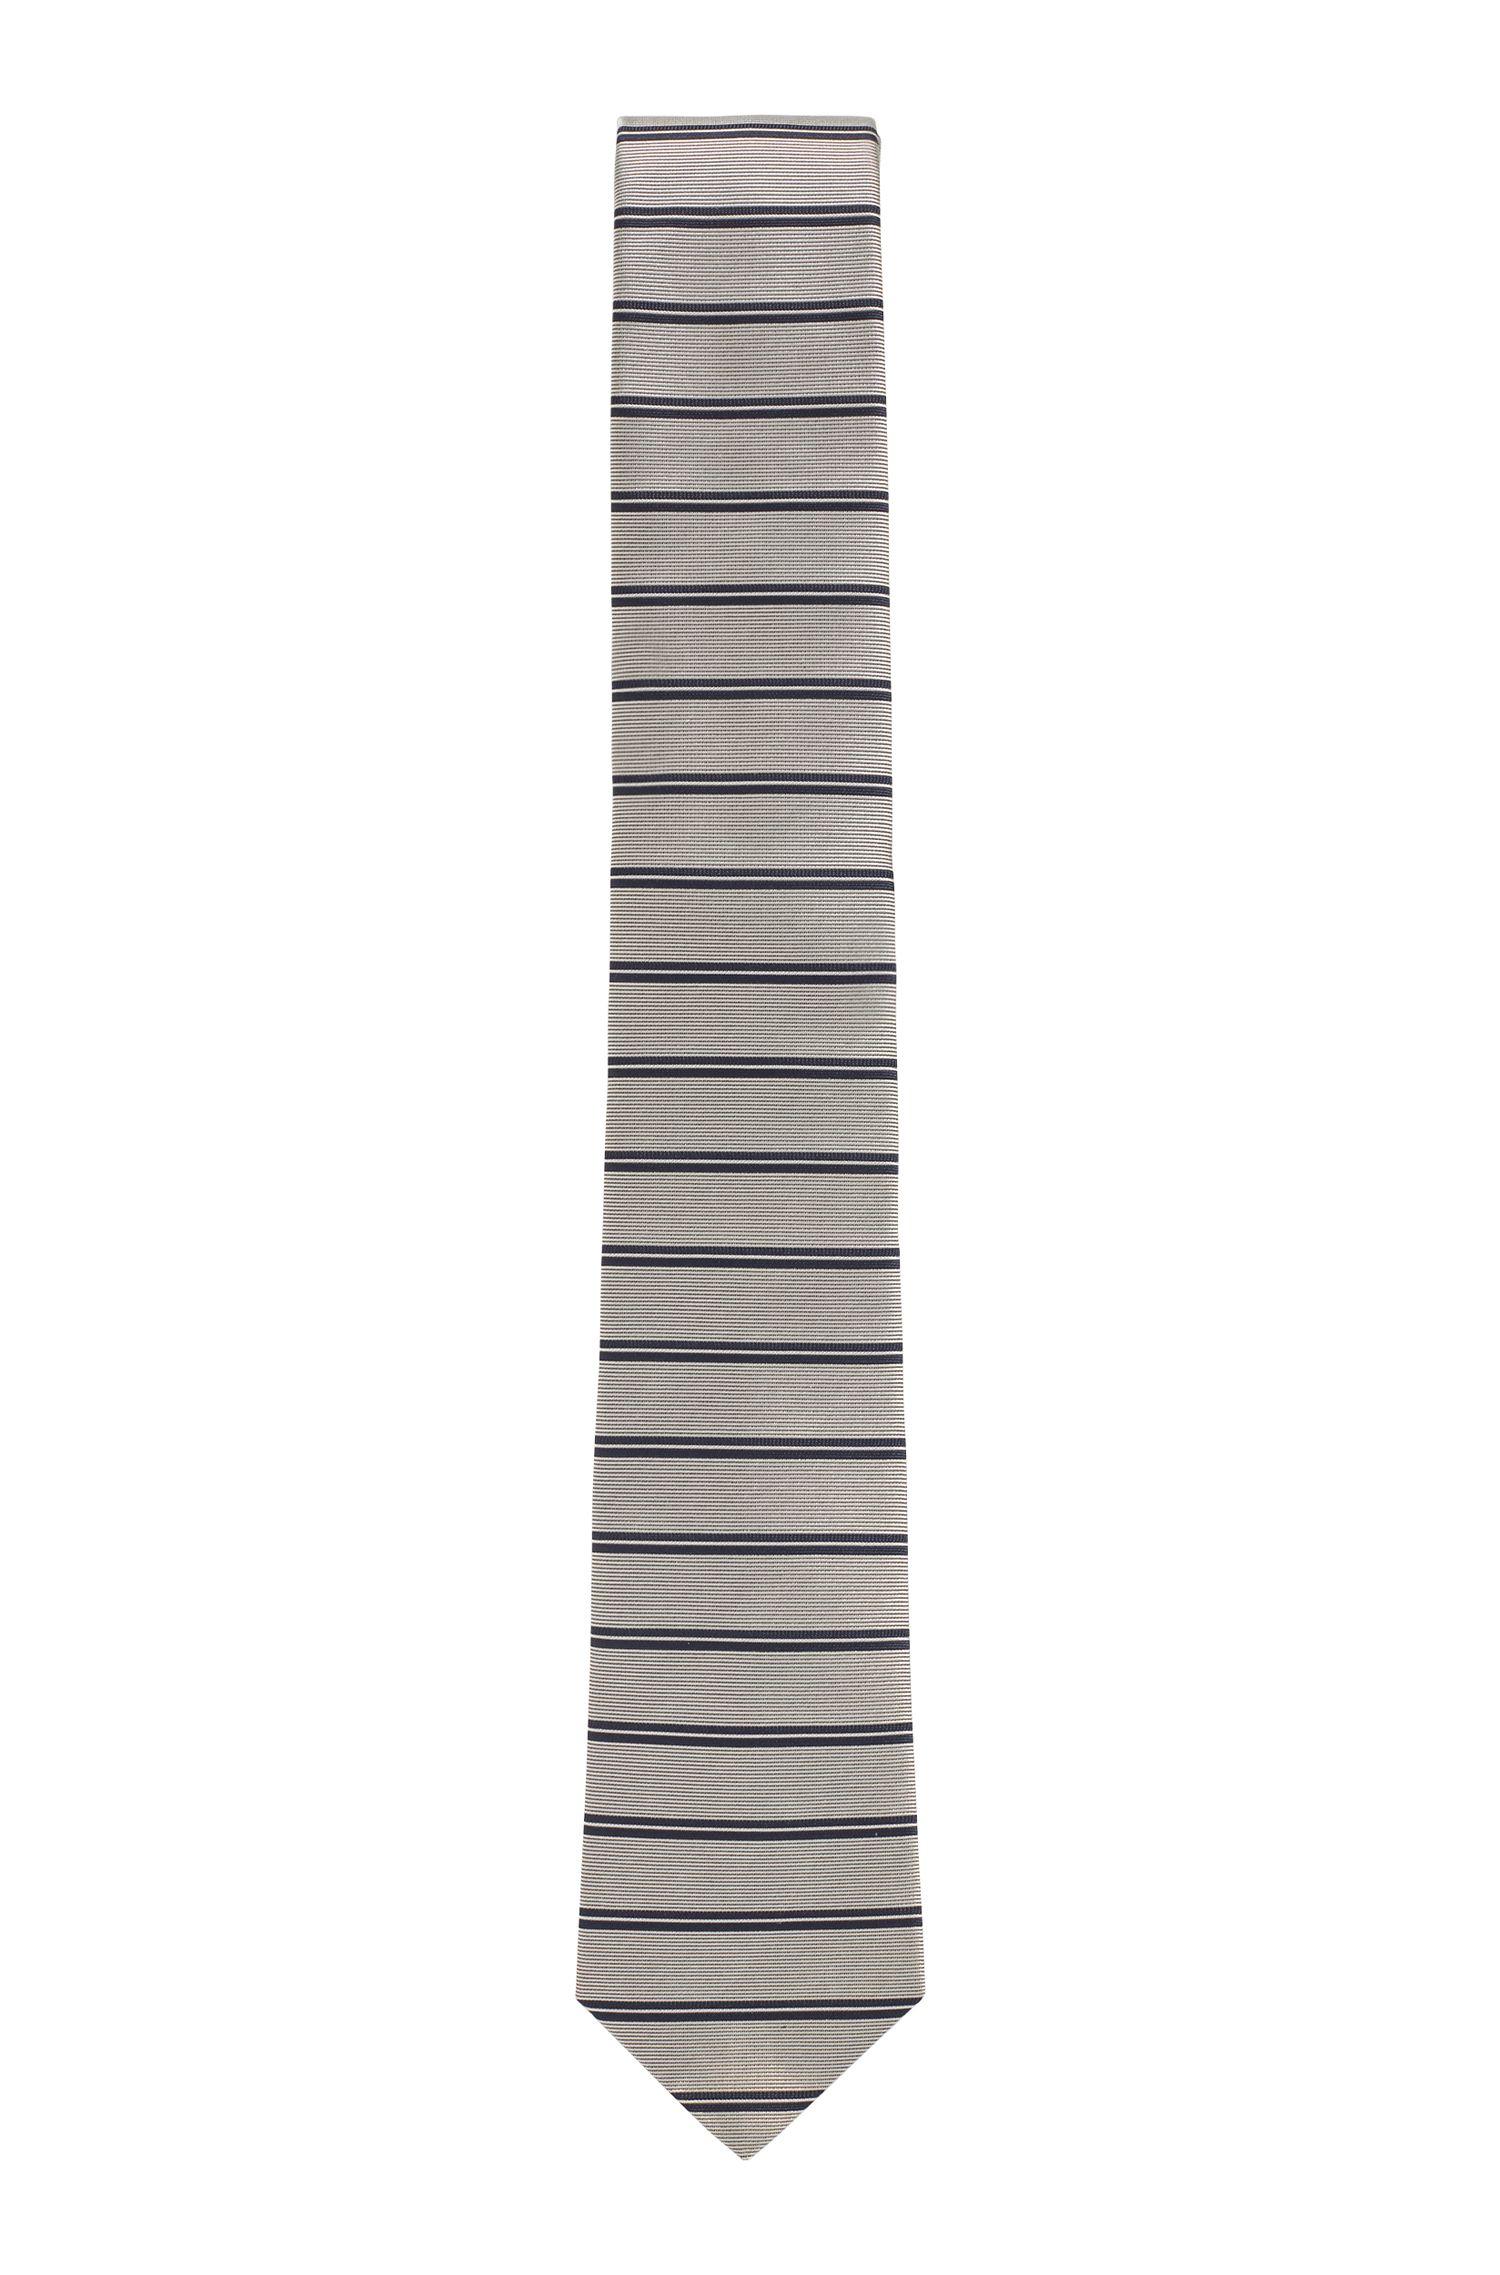 Handmade silk tie with horizontal stripes, Natural